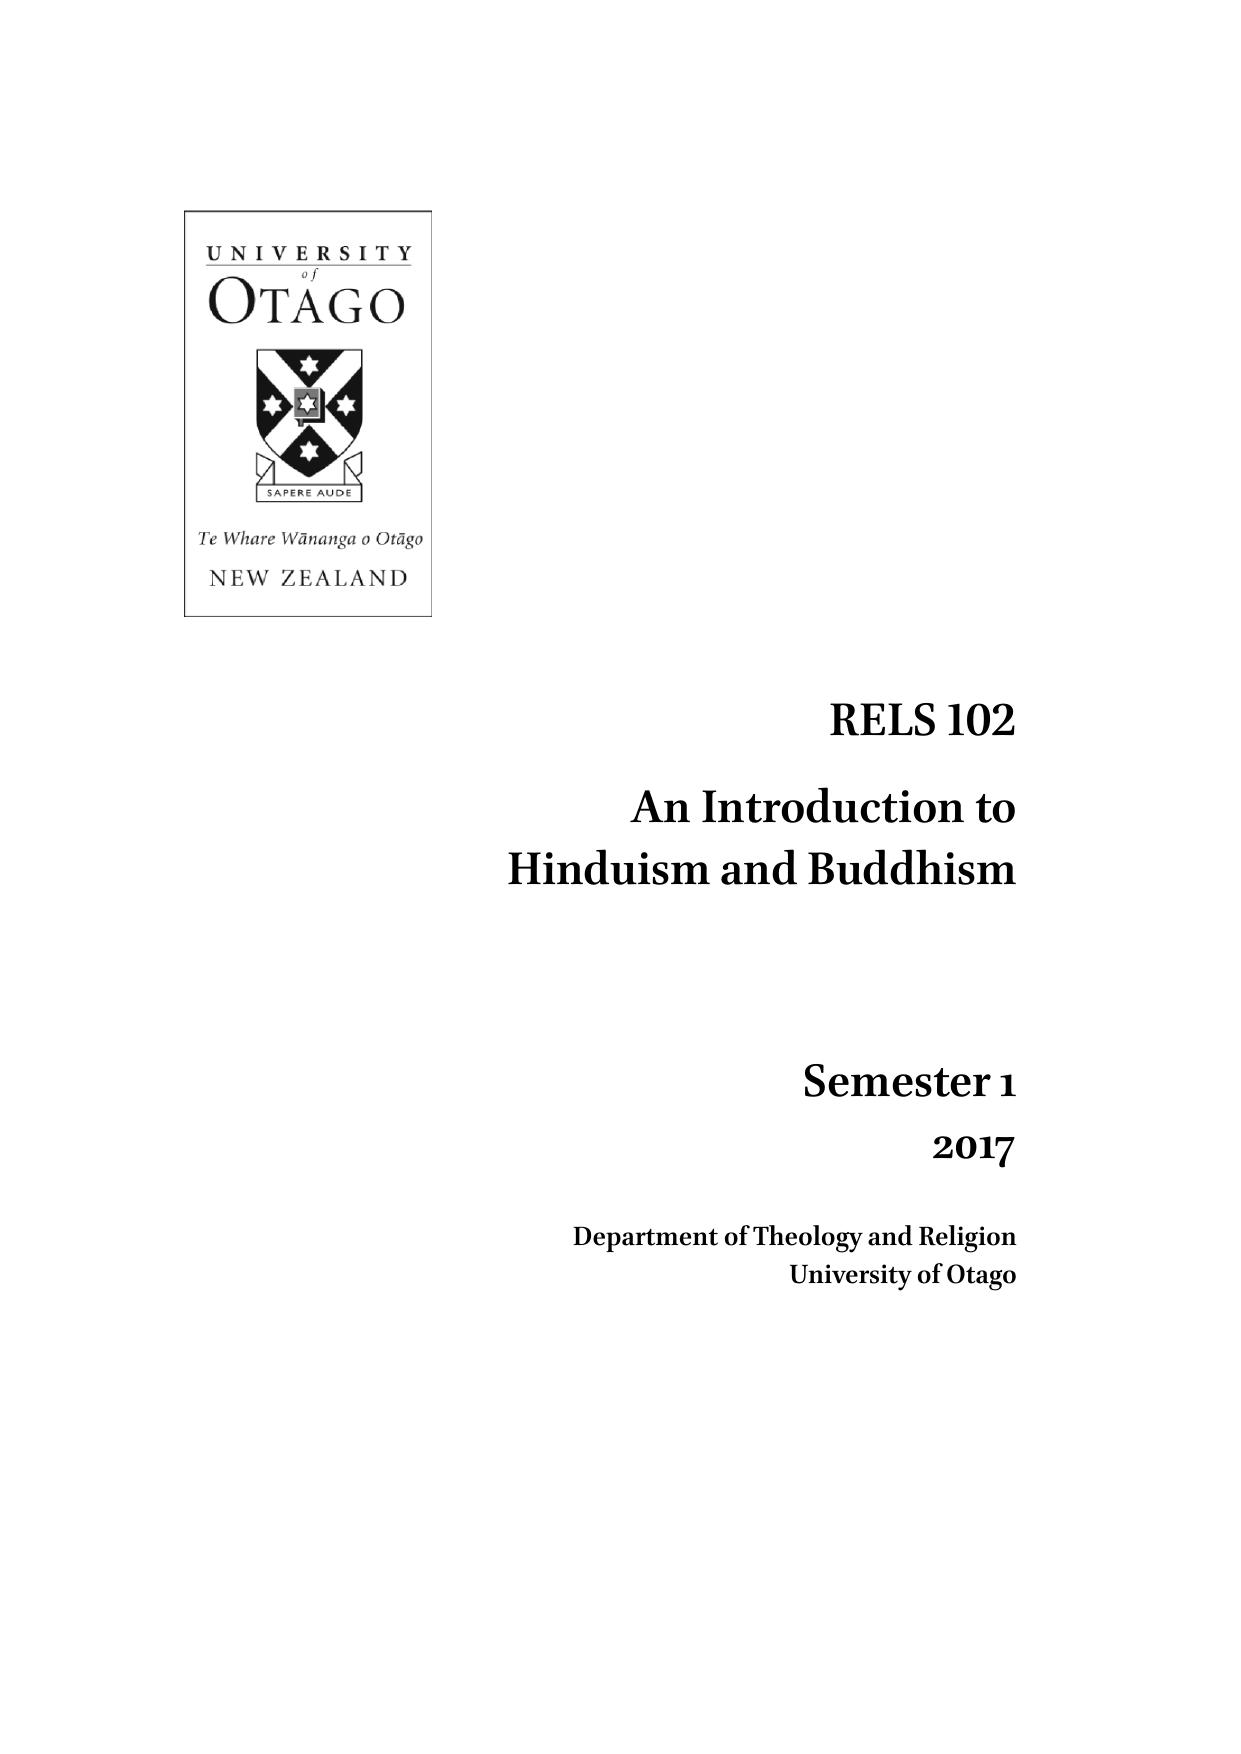 RELS102 AnIntroductionto HinduismandBuddhism Semester1 2017